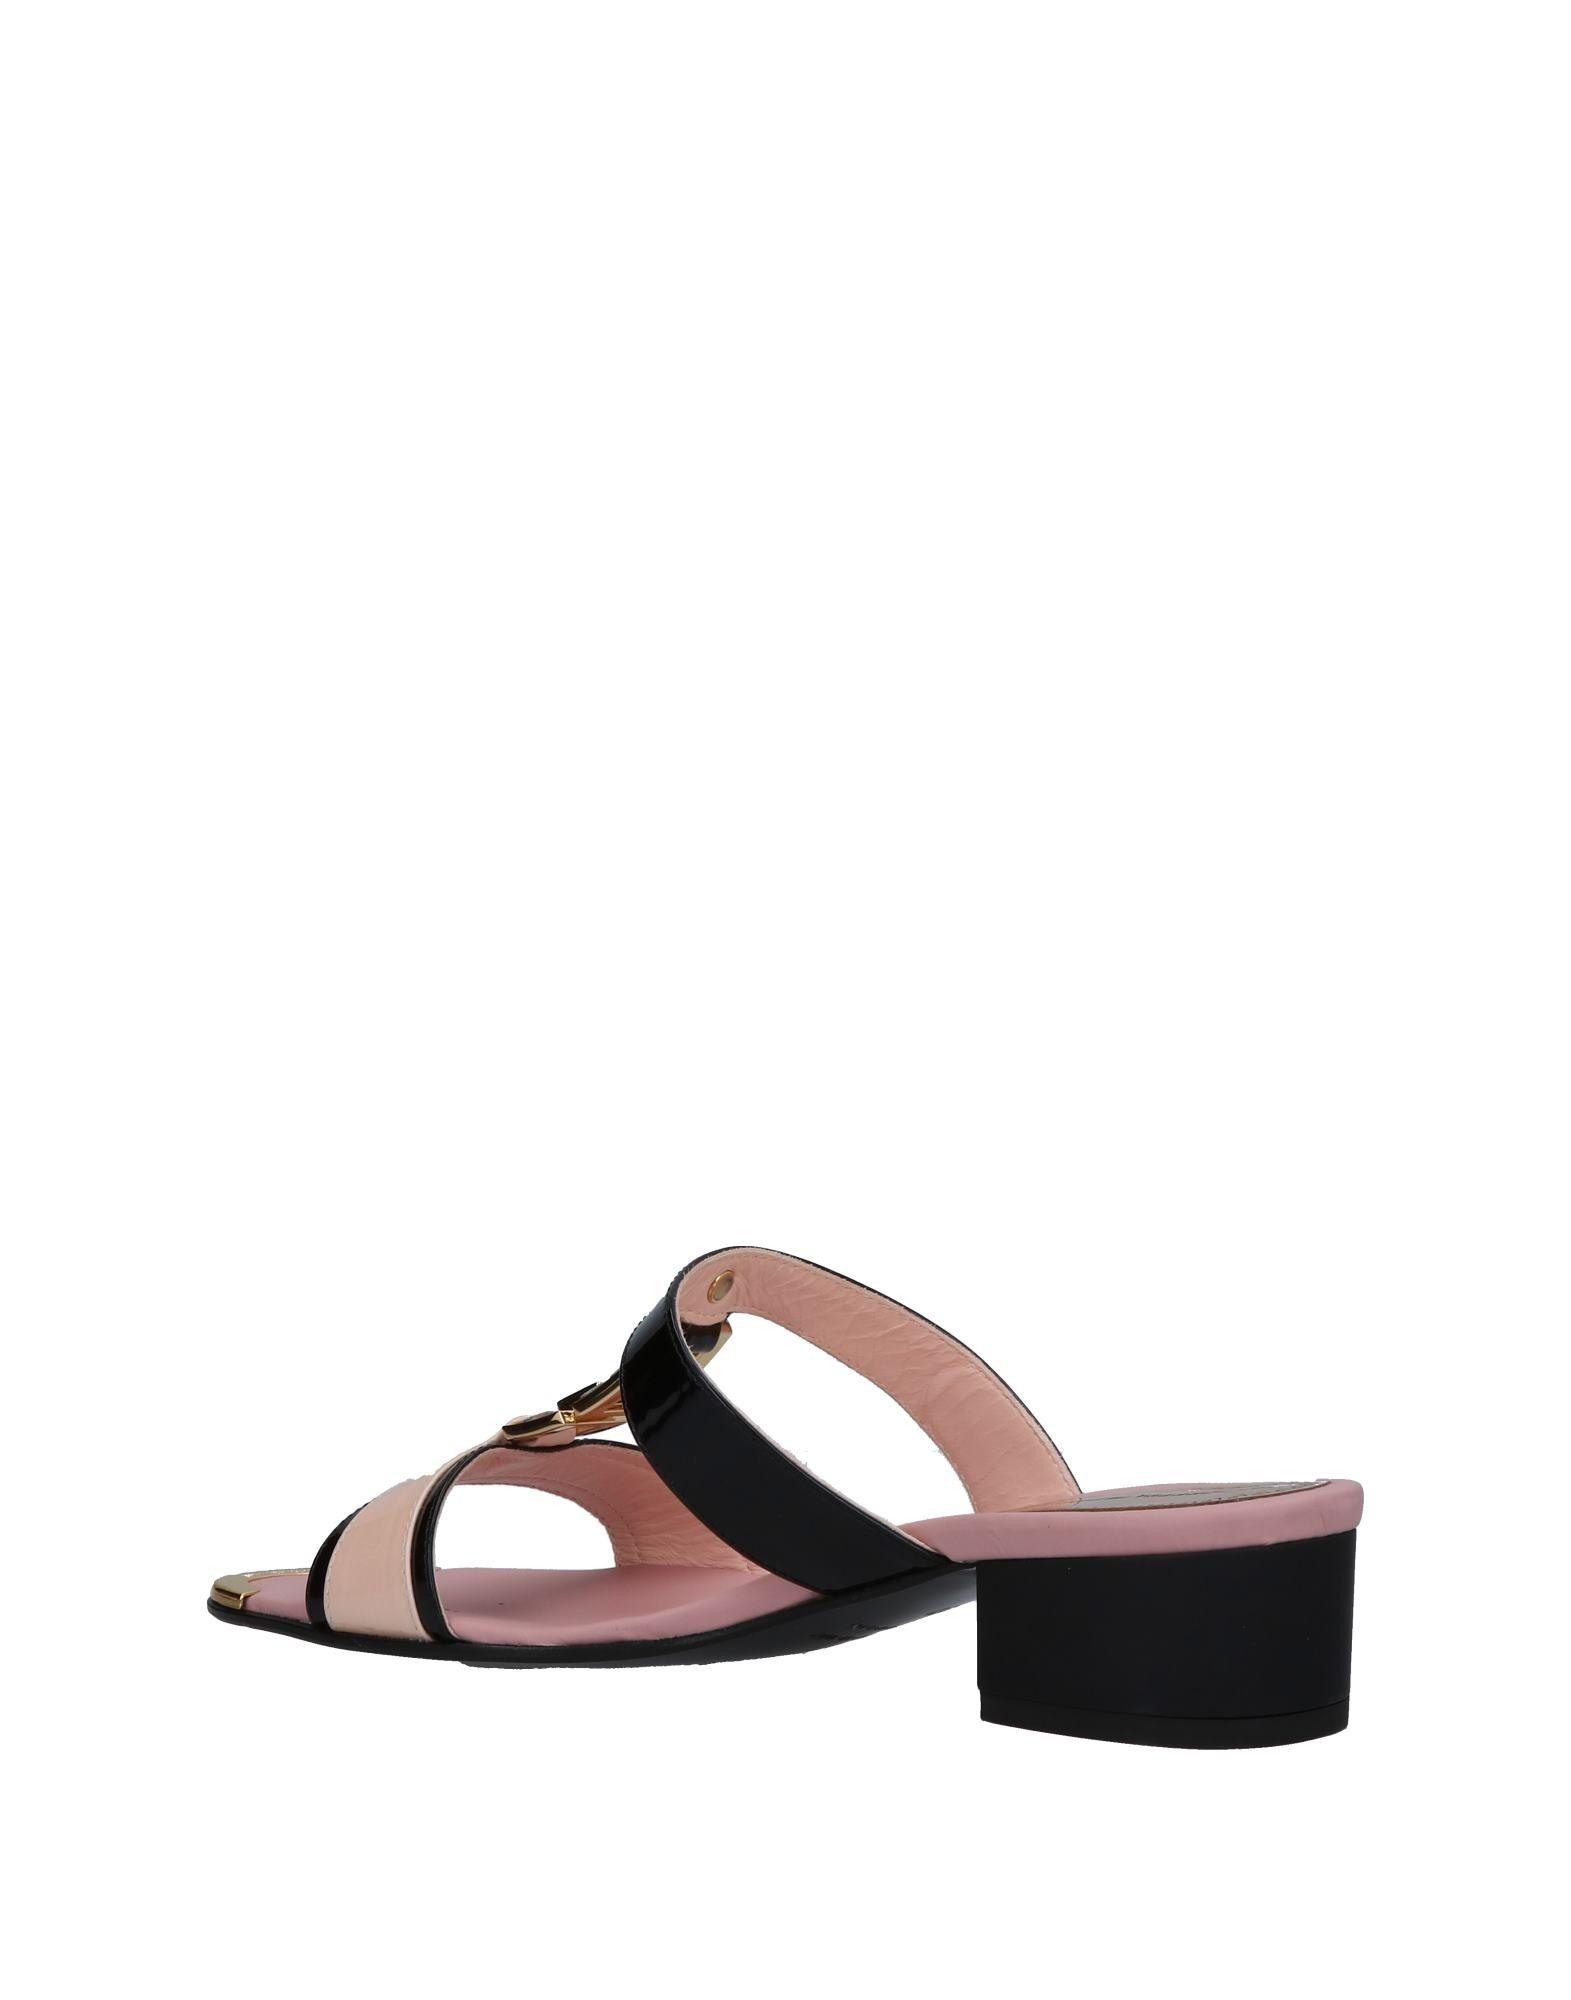 Loretta Pettinari Sandalen Schuhe Damen  11386533SE Gute Qualität beliebte Schuhe Sandalen f9e345